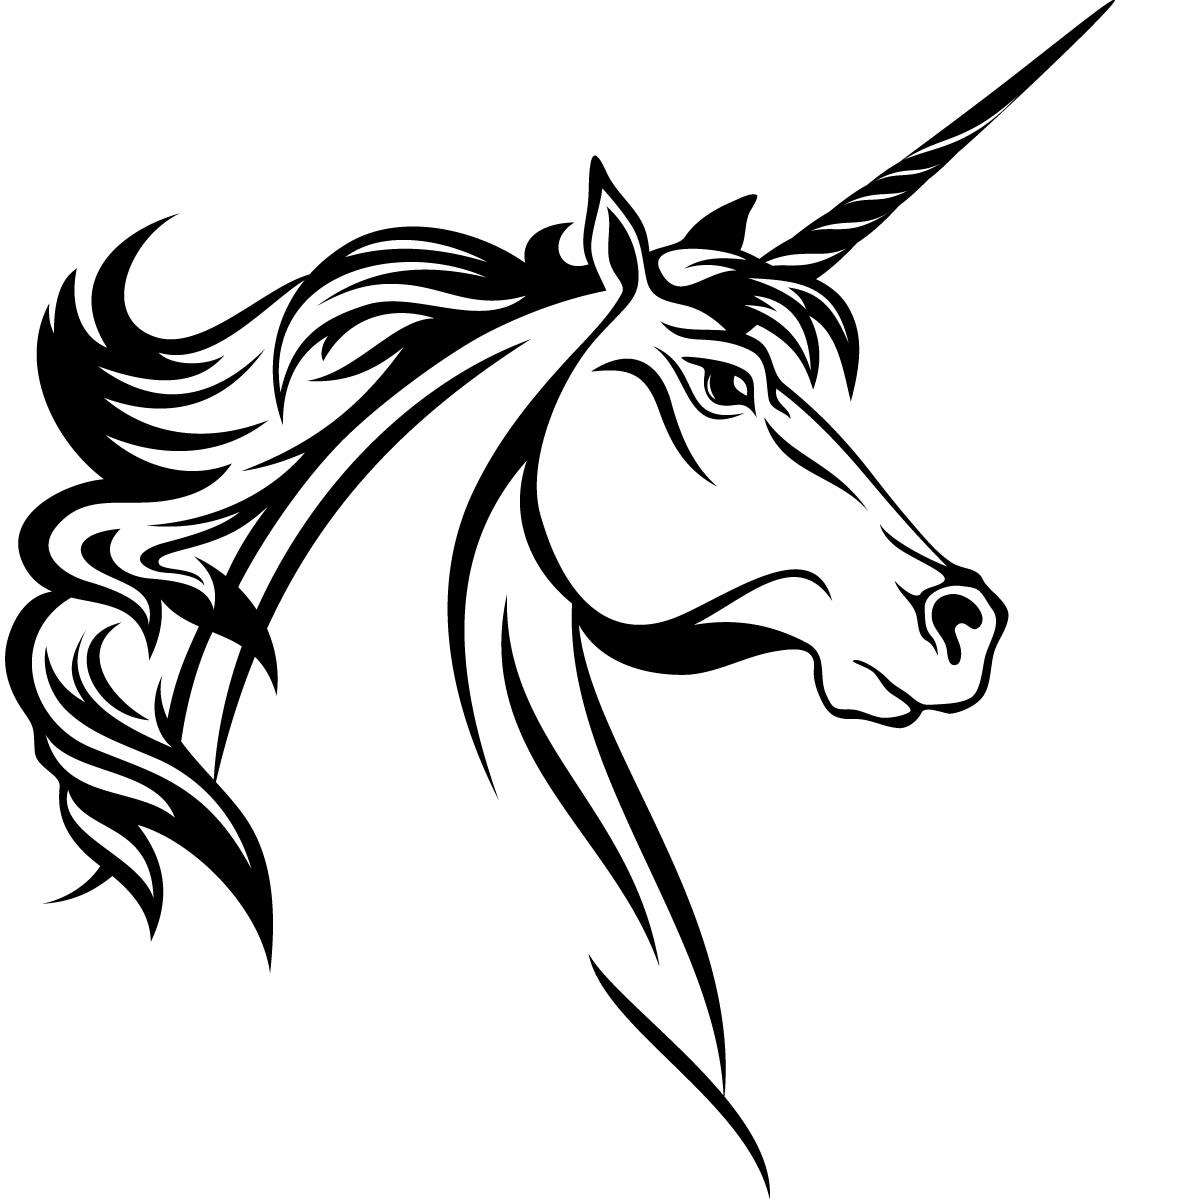 Unicorn head clipart free black and white picture royalty free stock Unicorn Clipart   Free download best Unicorn Clipart on ... picture royalty free stock